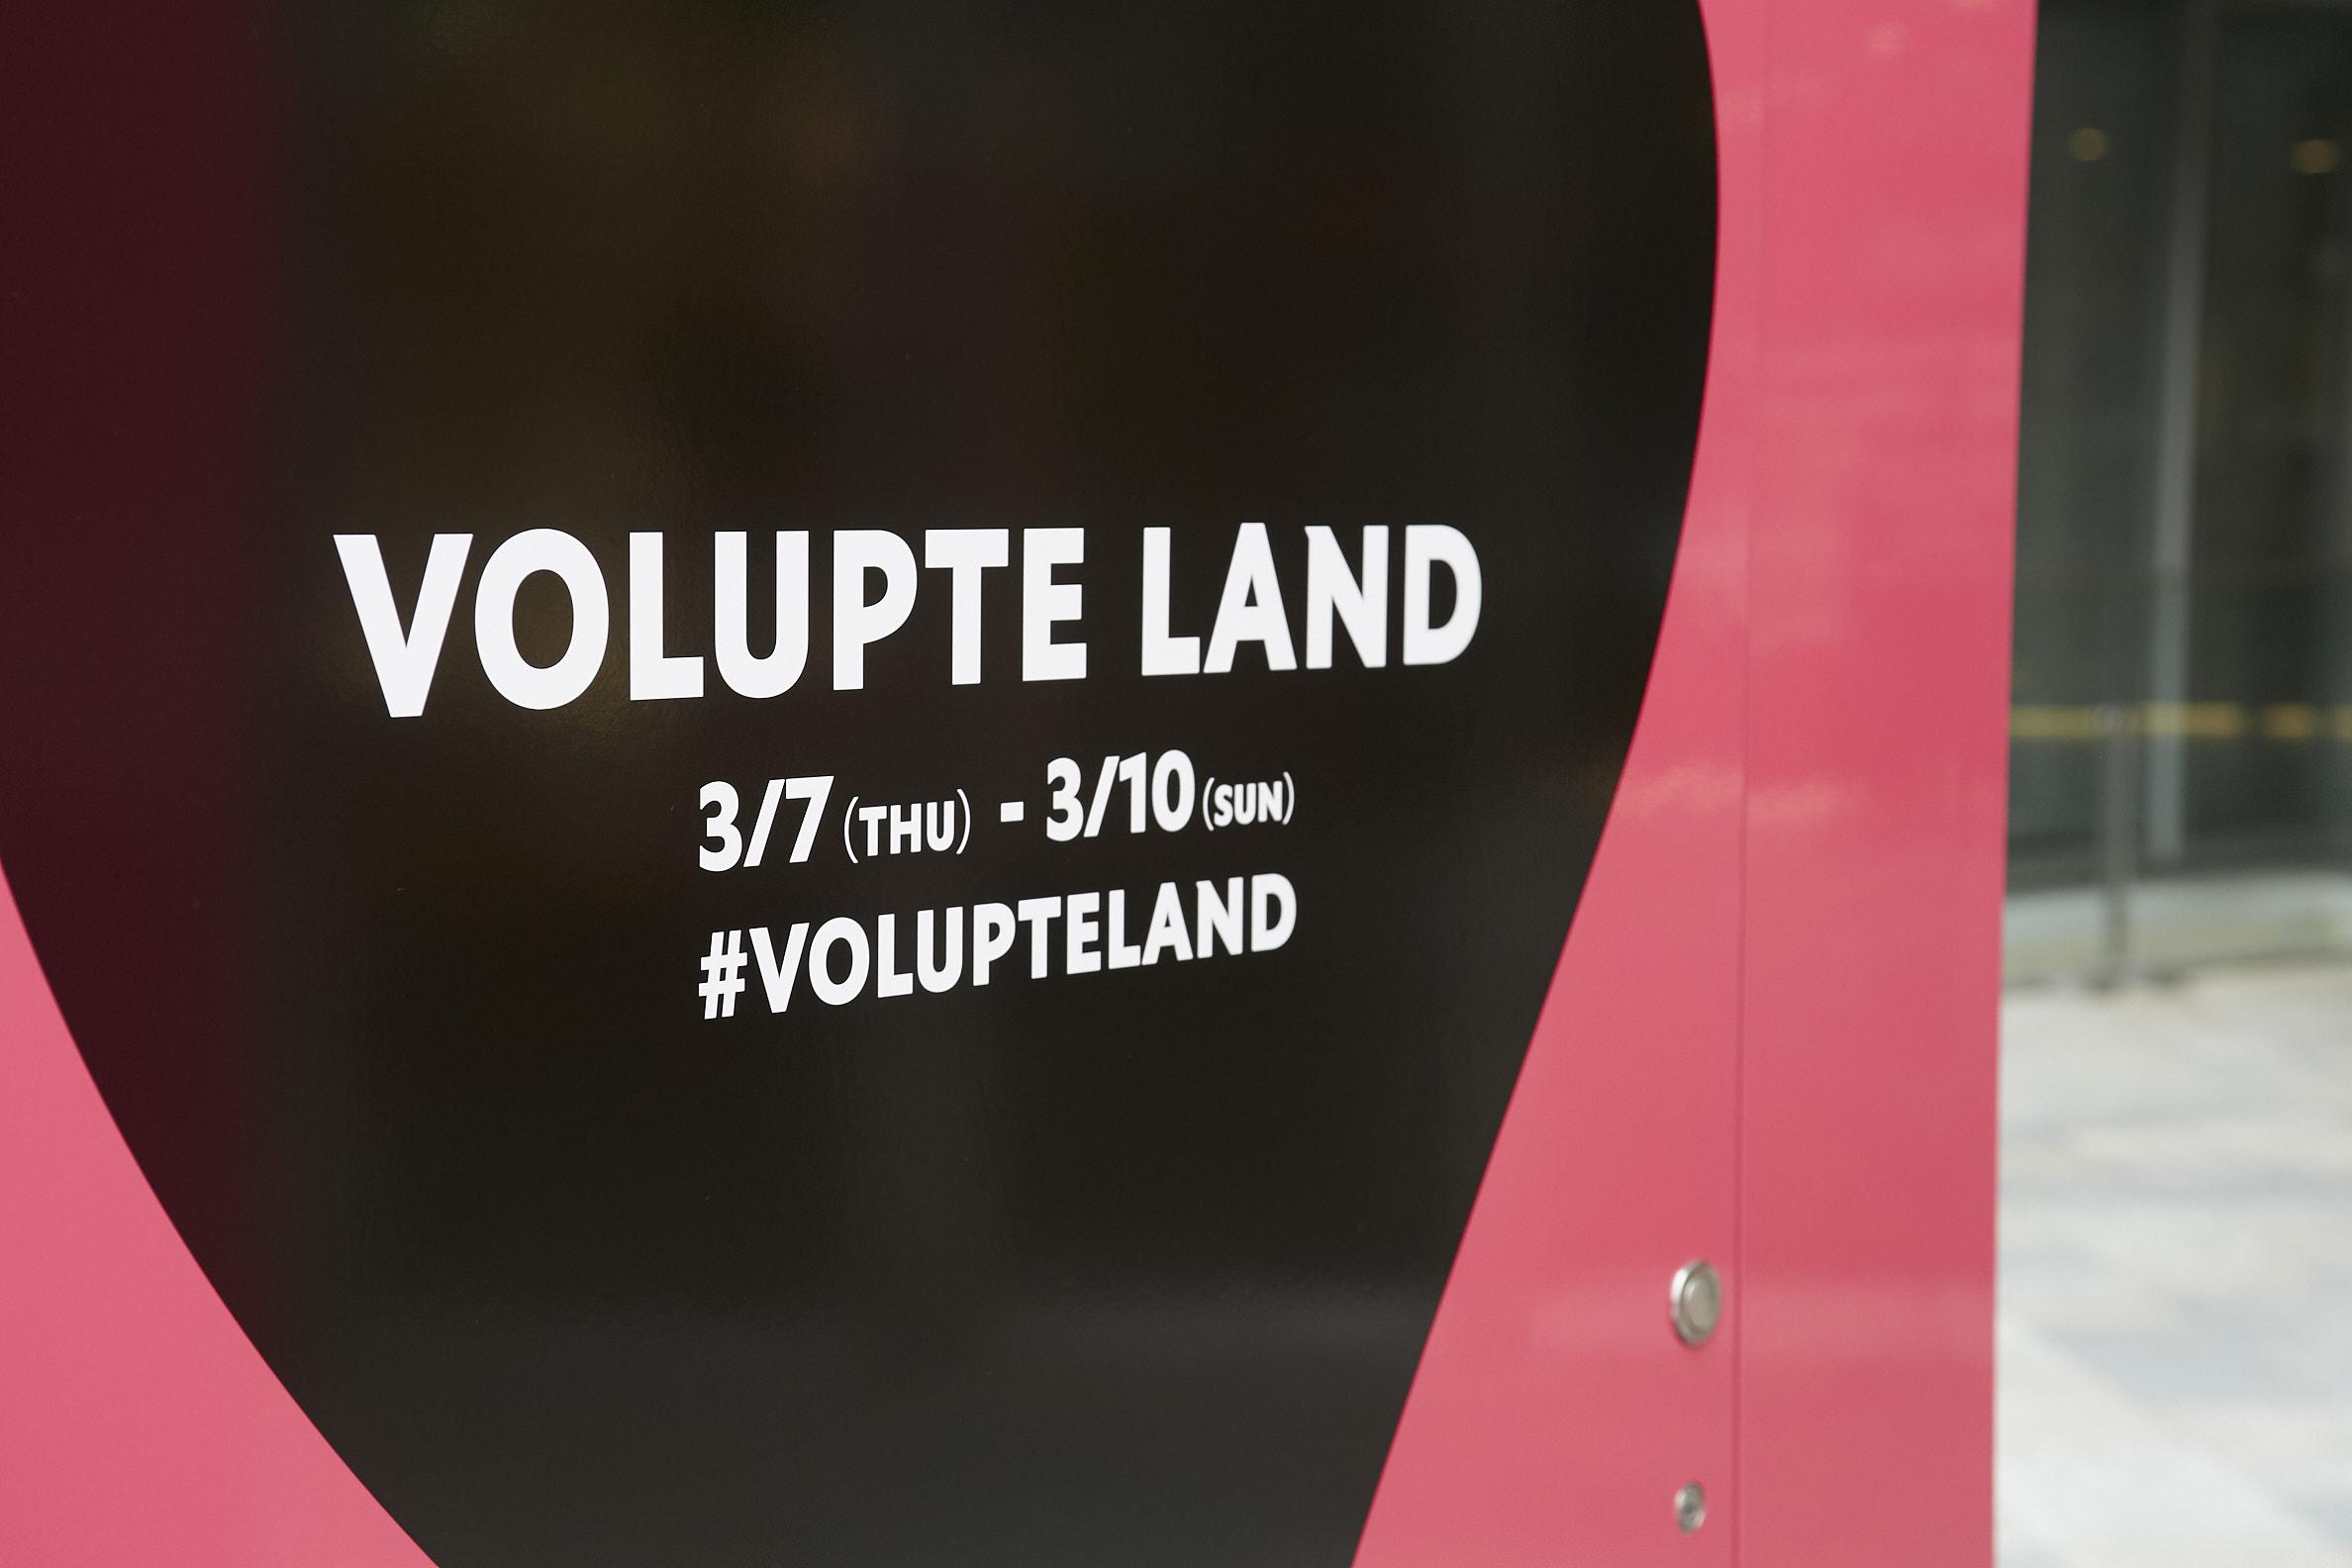 Yves Saint-Laurent Beaute(イヴ・サンローラン・ボーテ)が開催するスペシャルイベント「VOLUPTE LAND(ヴォリュプテ ランド)」(表参道ヒルズ/2019年3月6日)